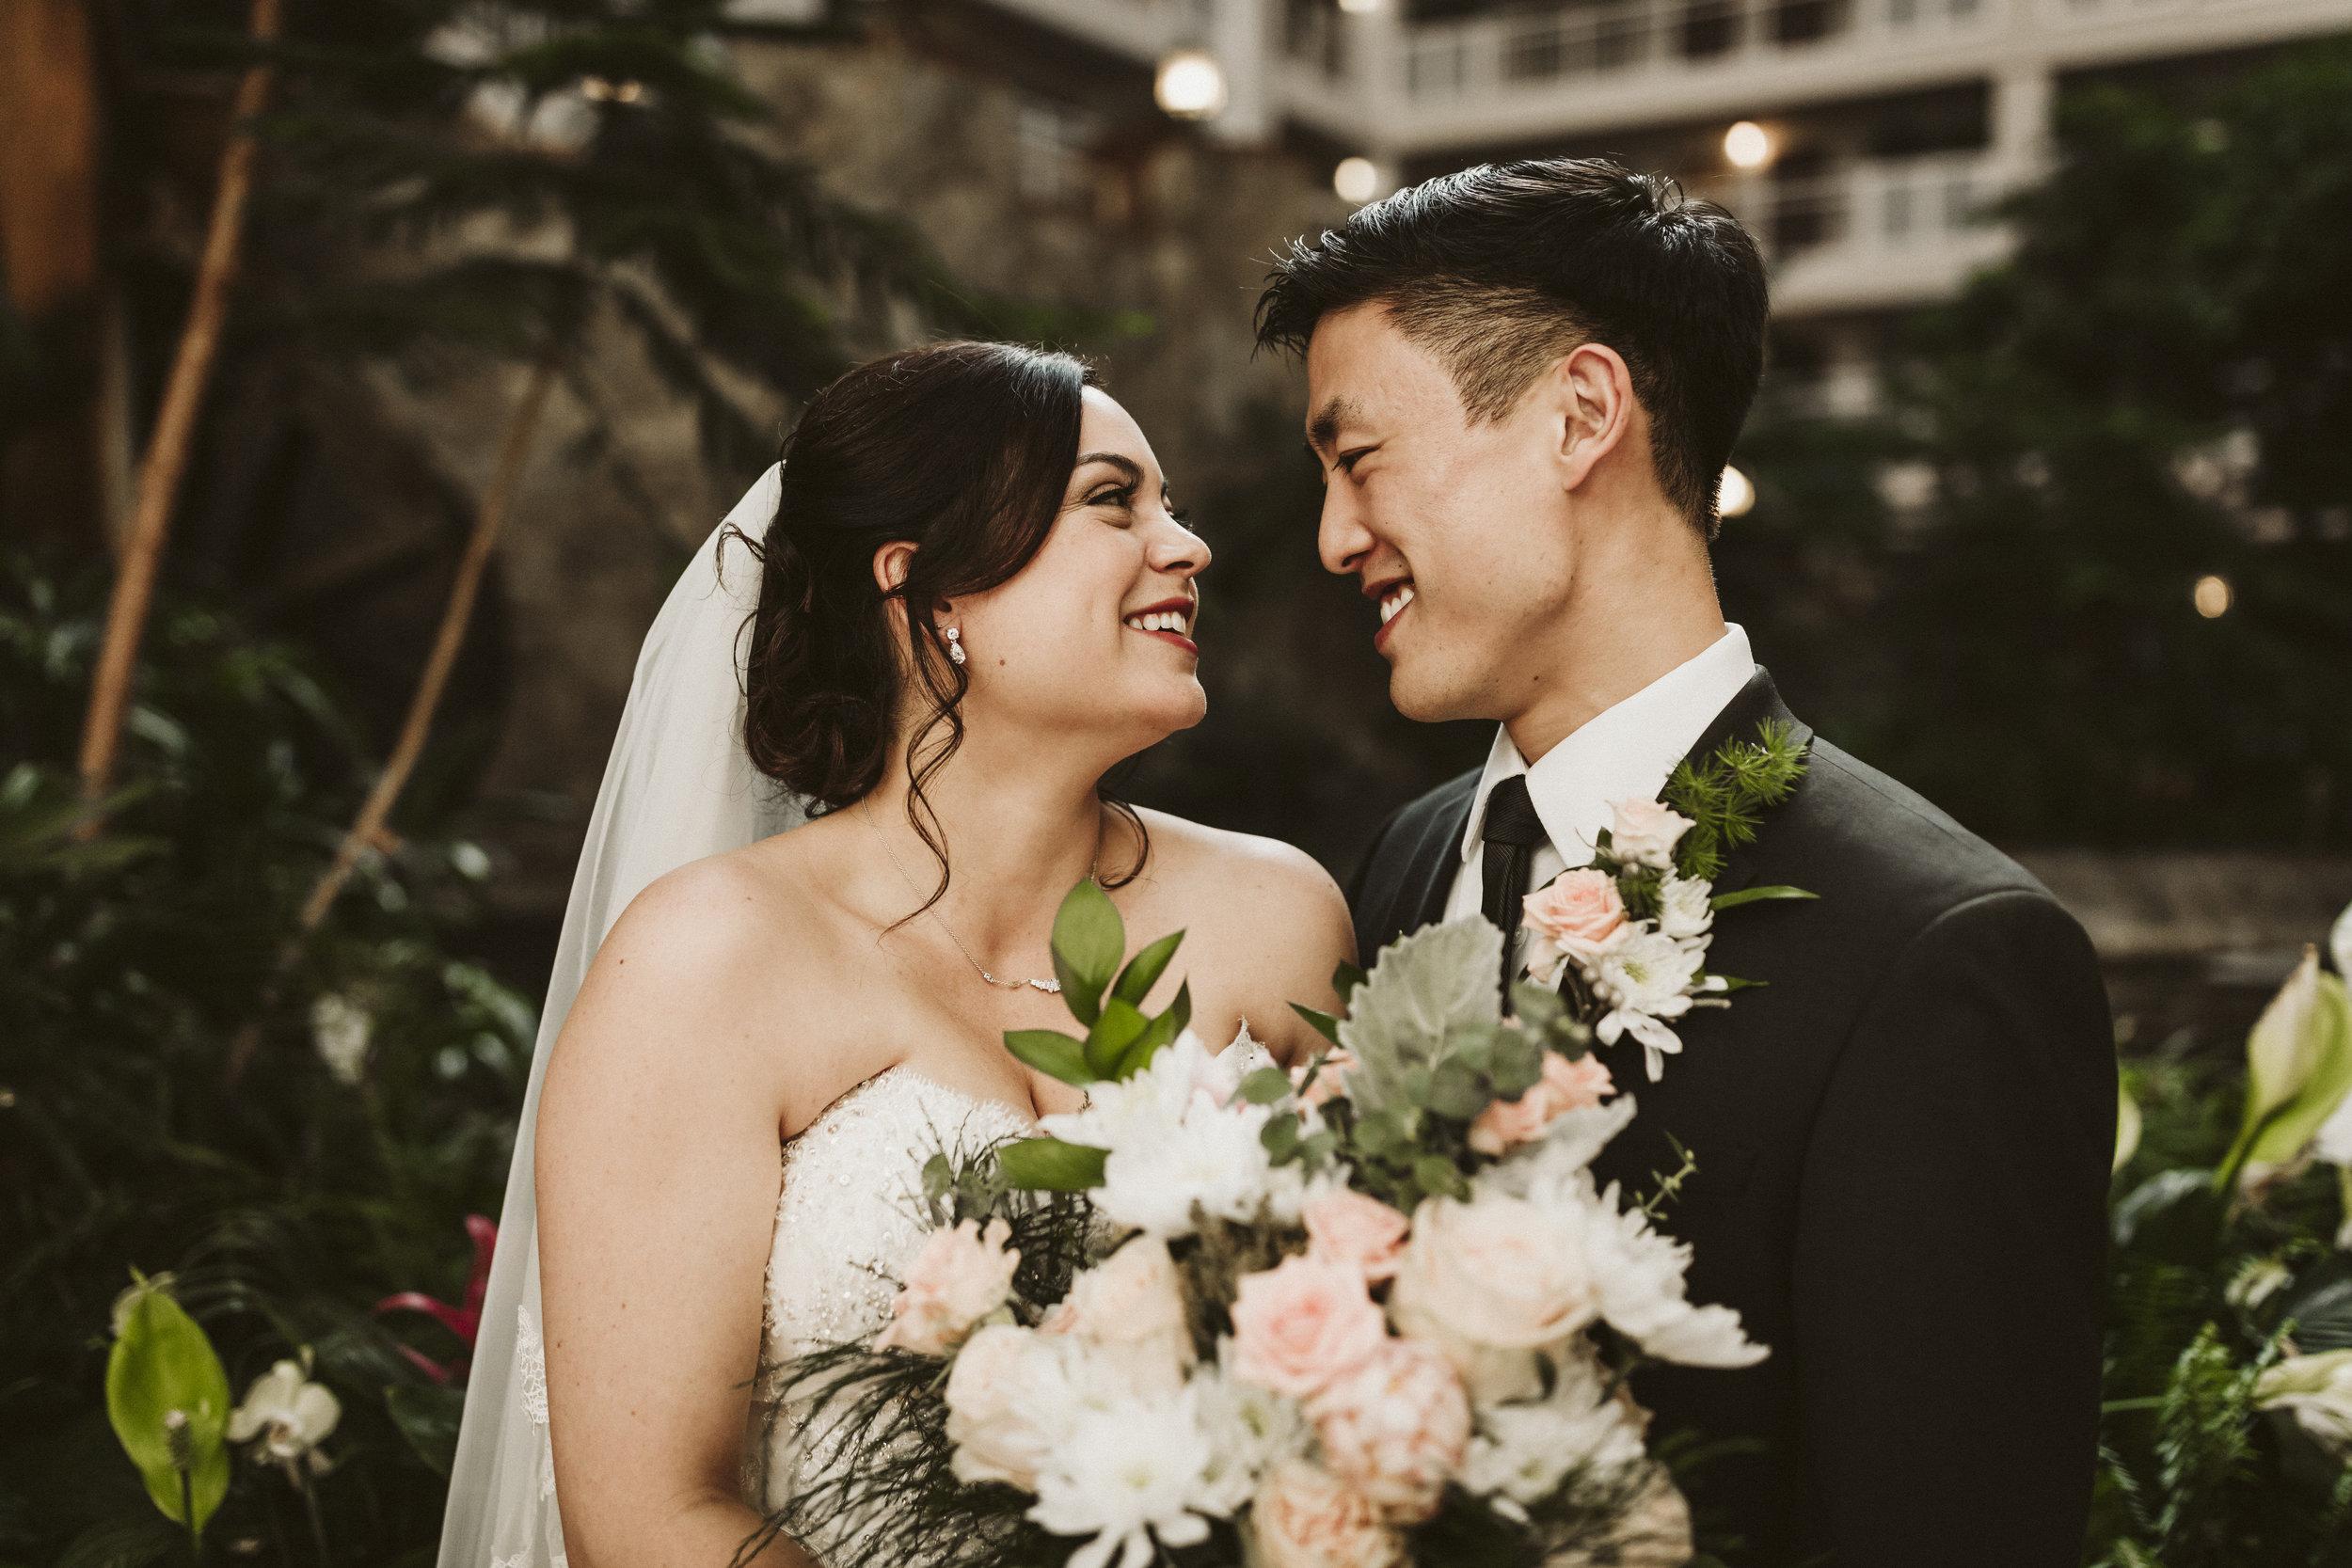 _P8A0638vildphotography-wedding-tahoewedding-laketahoe-Jeena_Hayden.jpg